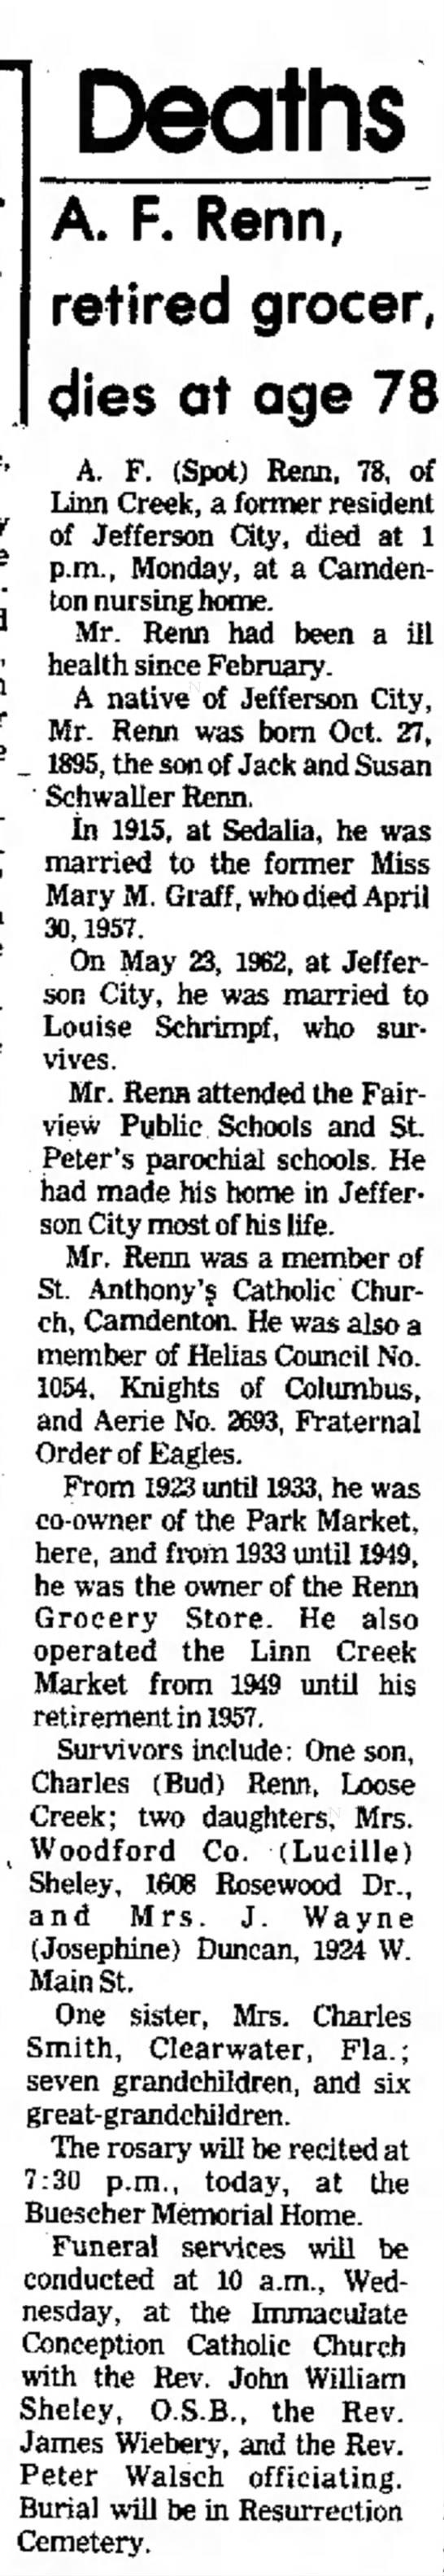 Alfred Francis Renn newspaper obituary